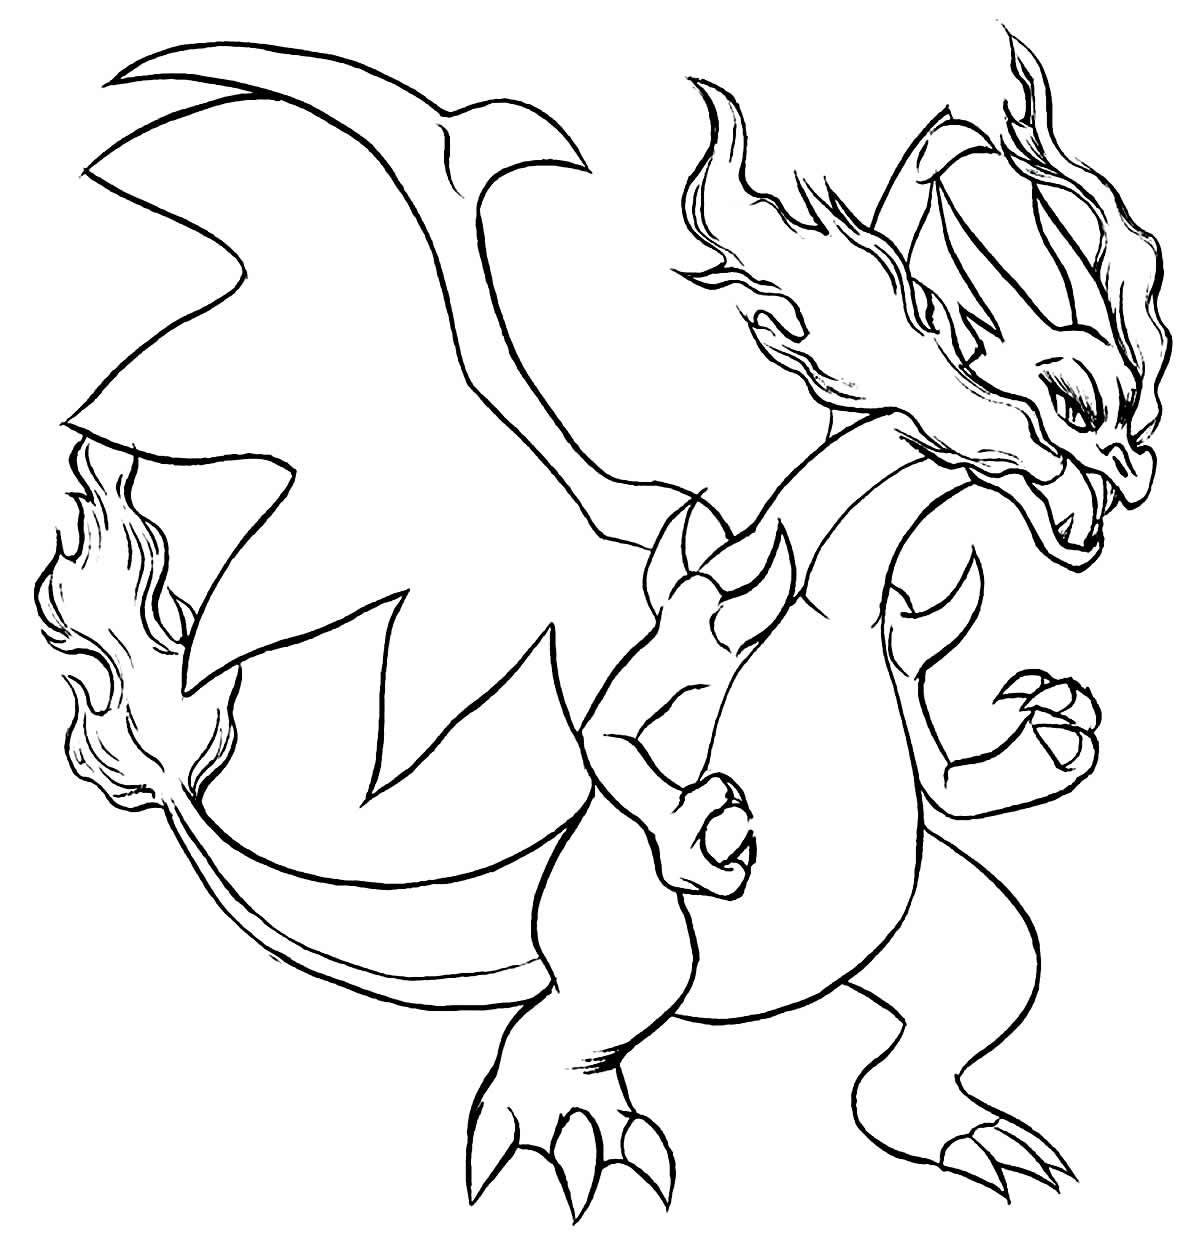 Desenho de Charizard para colorir